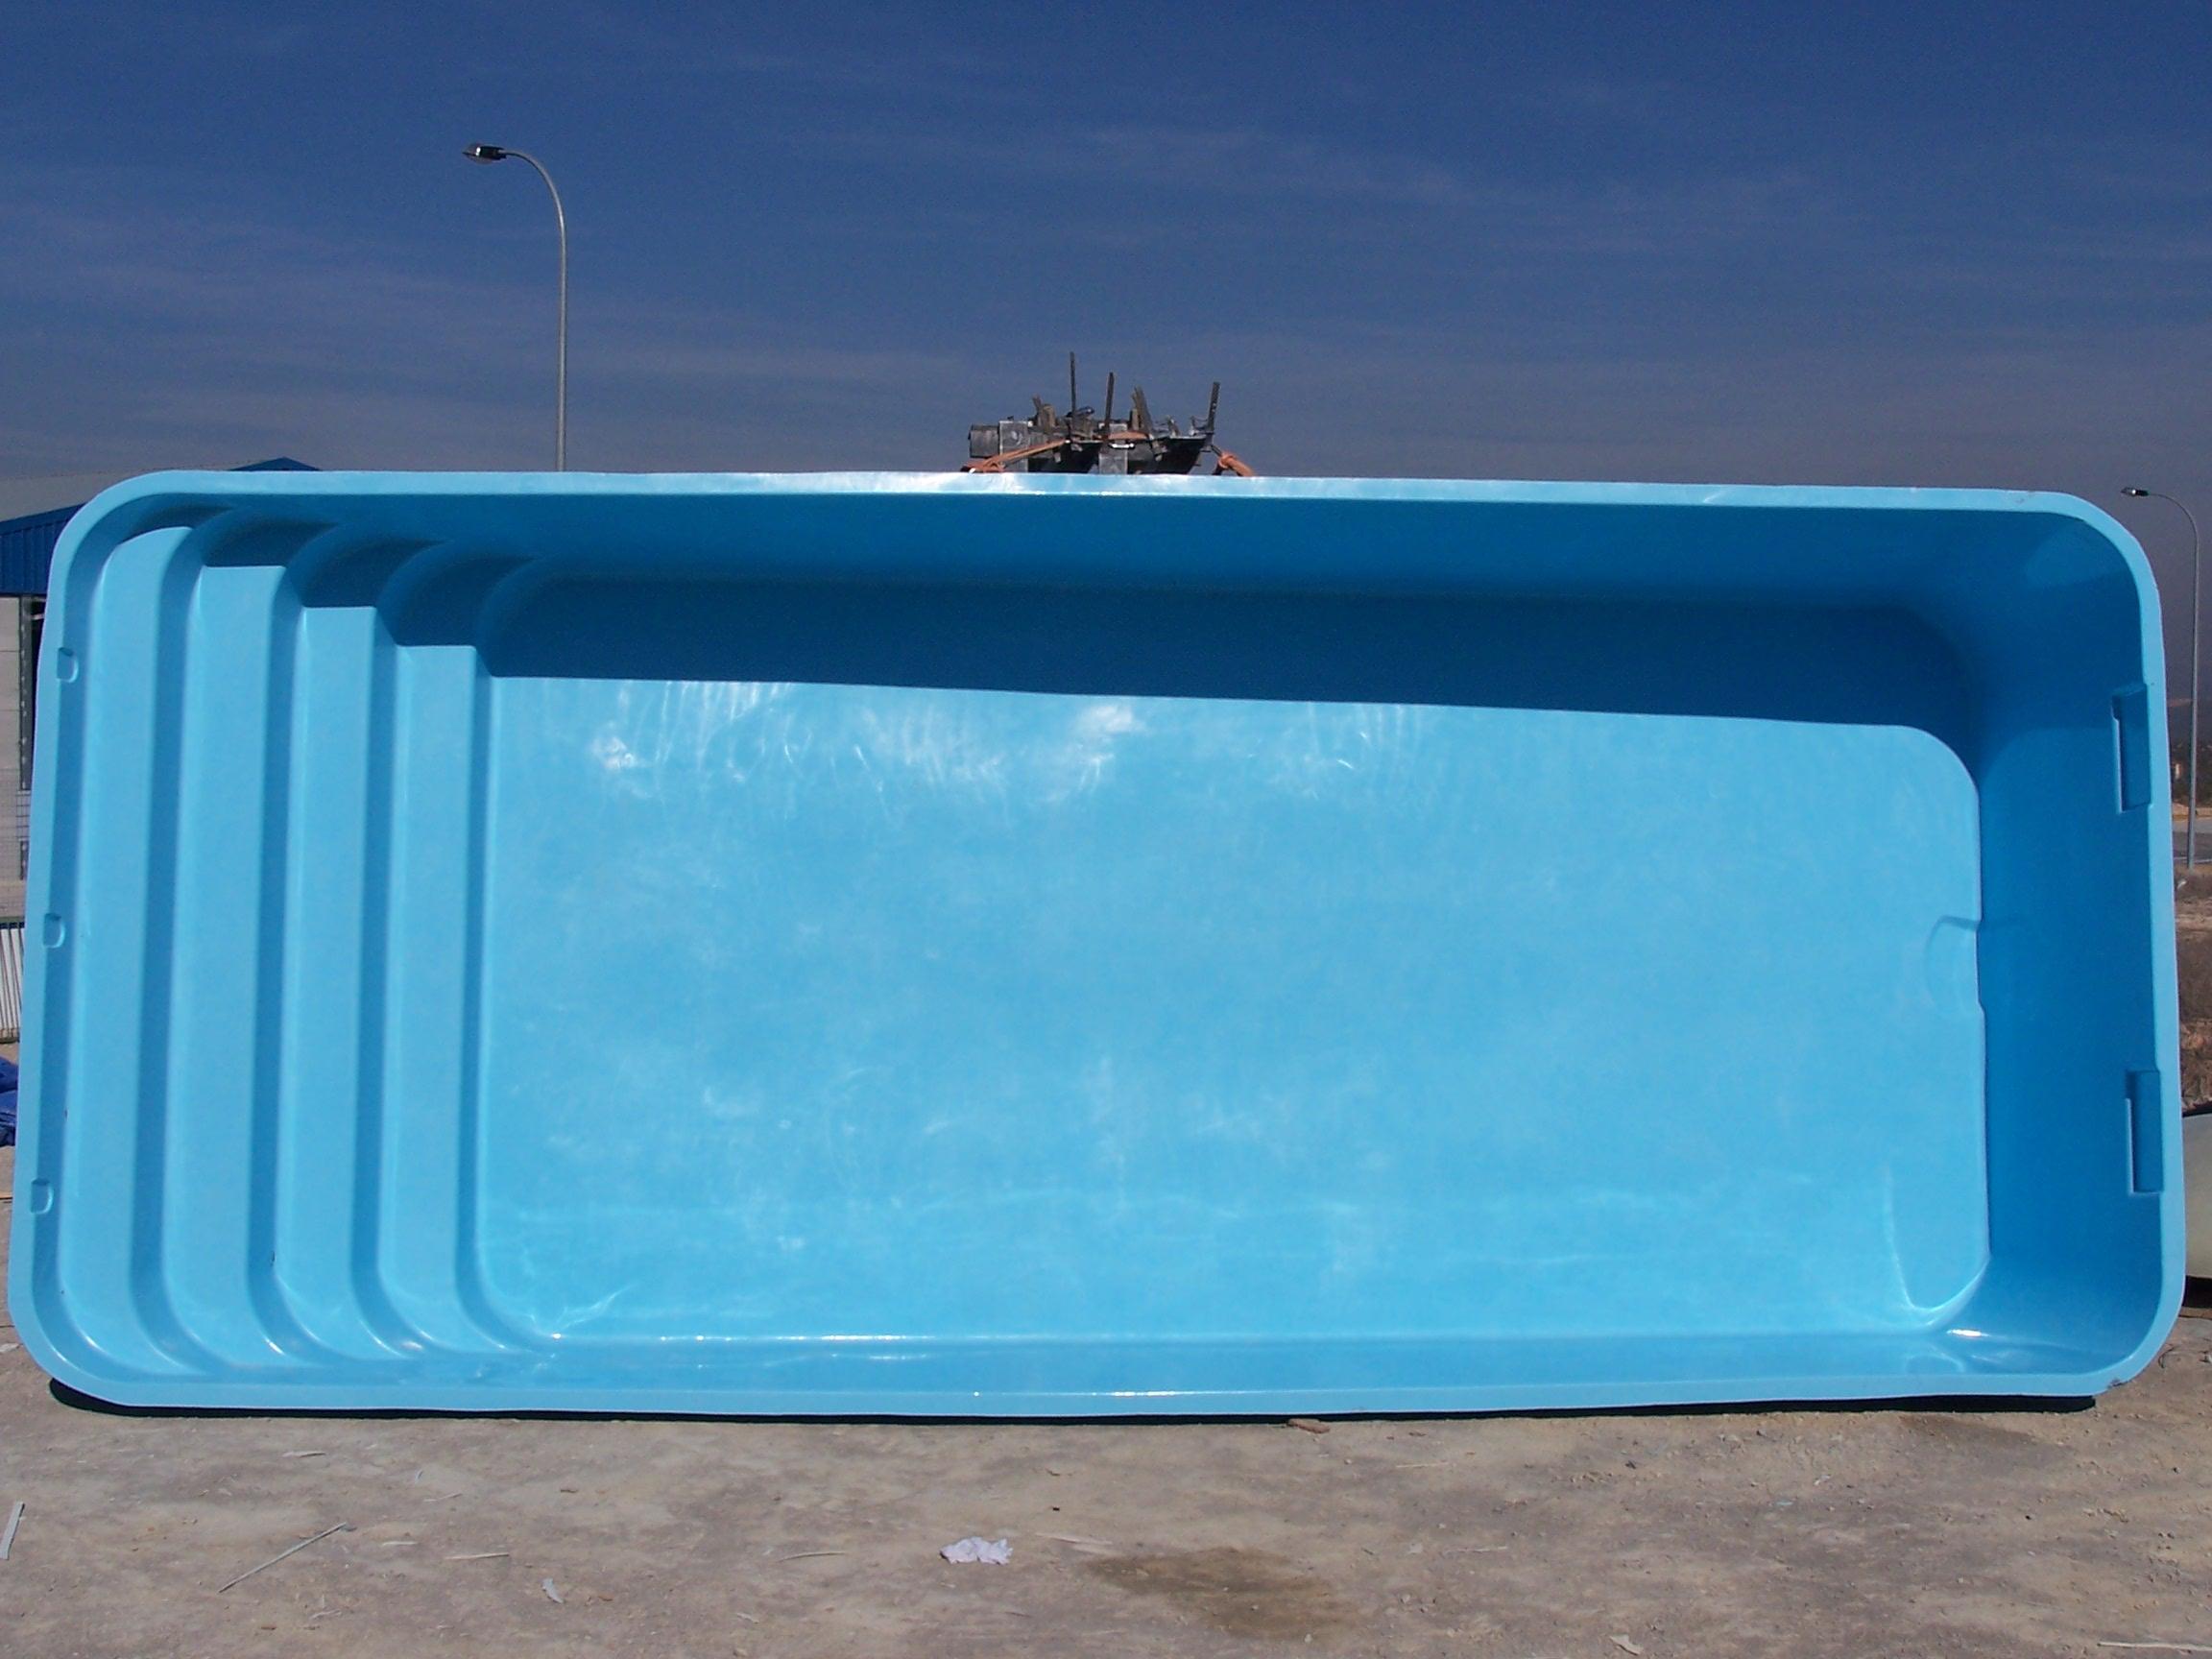 Piscinas baratas de fibra gallery of latest piscinas de for Precio piscinas poliester baratas